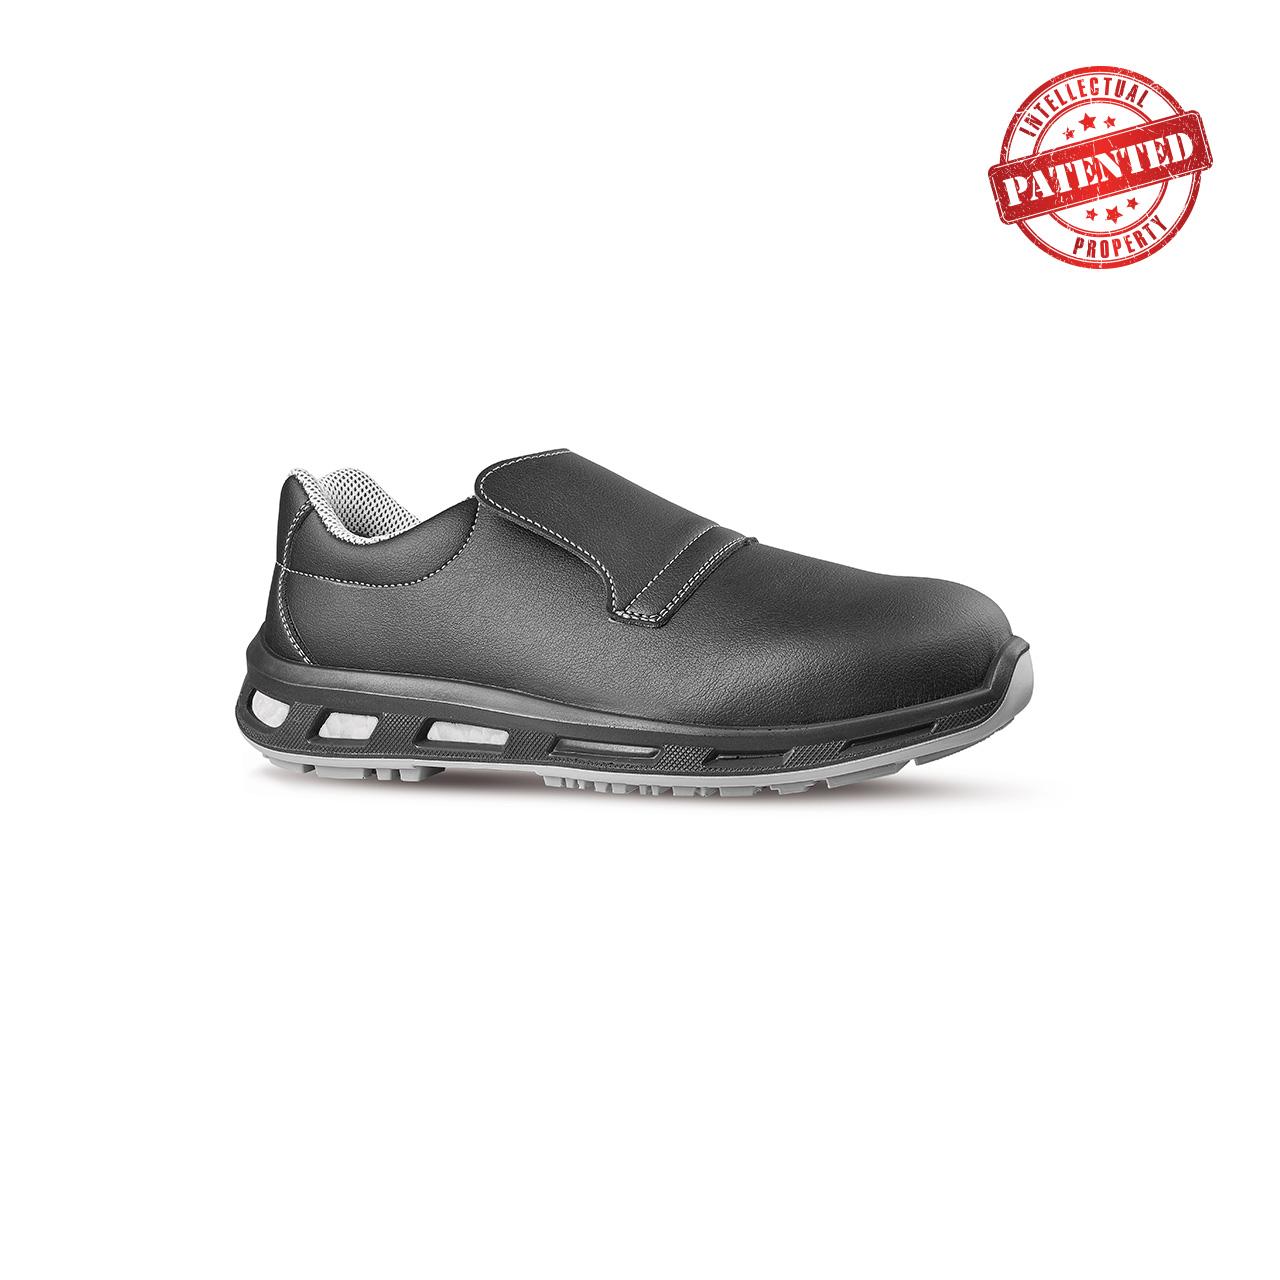 scarpa antinfortunistica upower modello noir linea redlion vista laterale